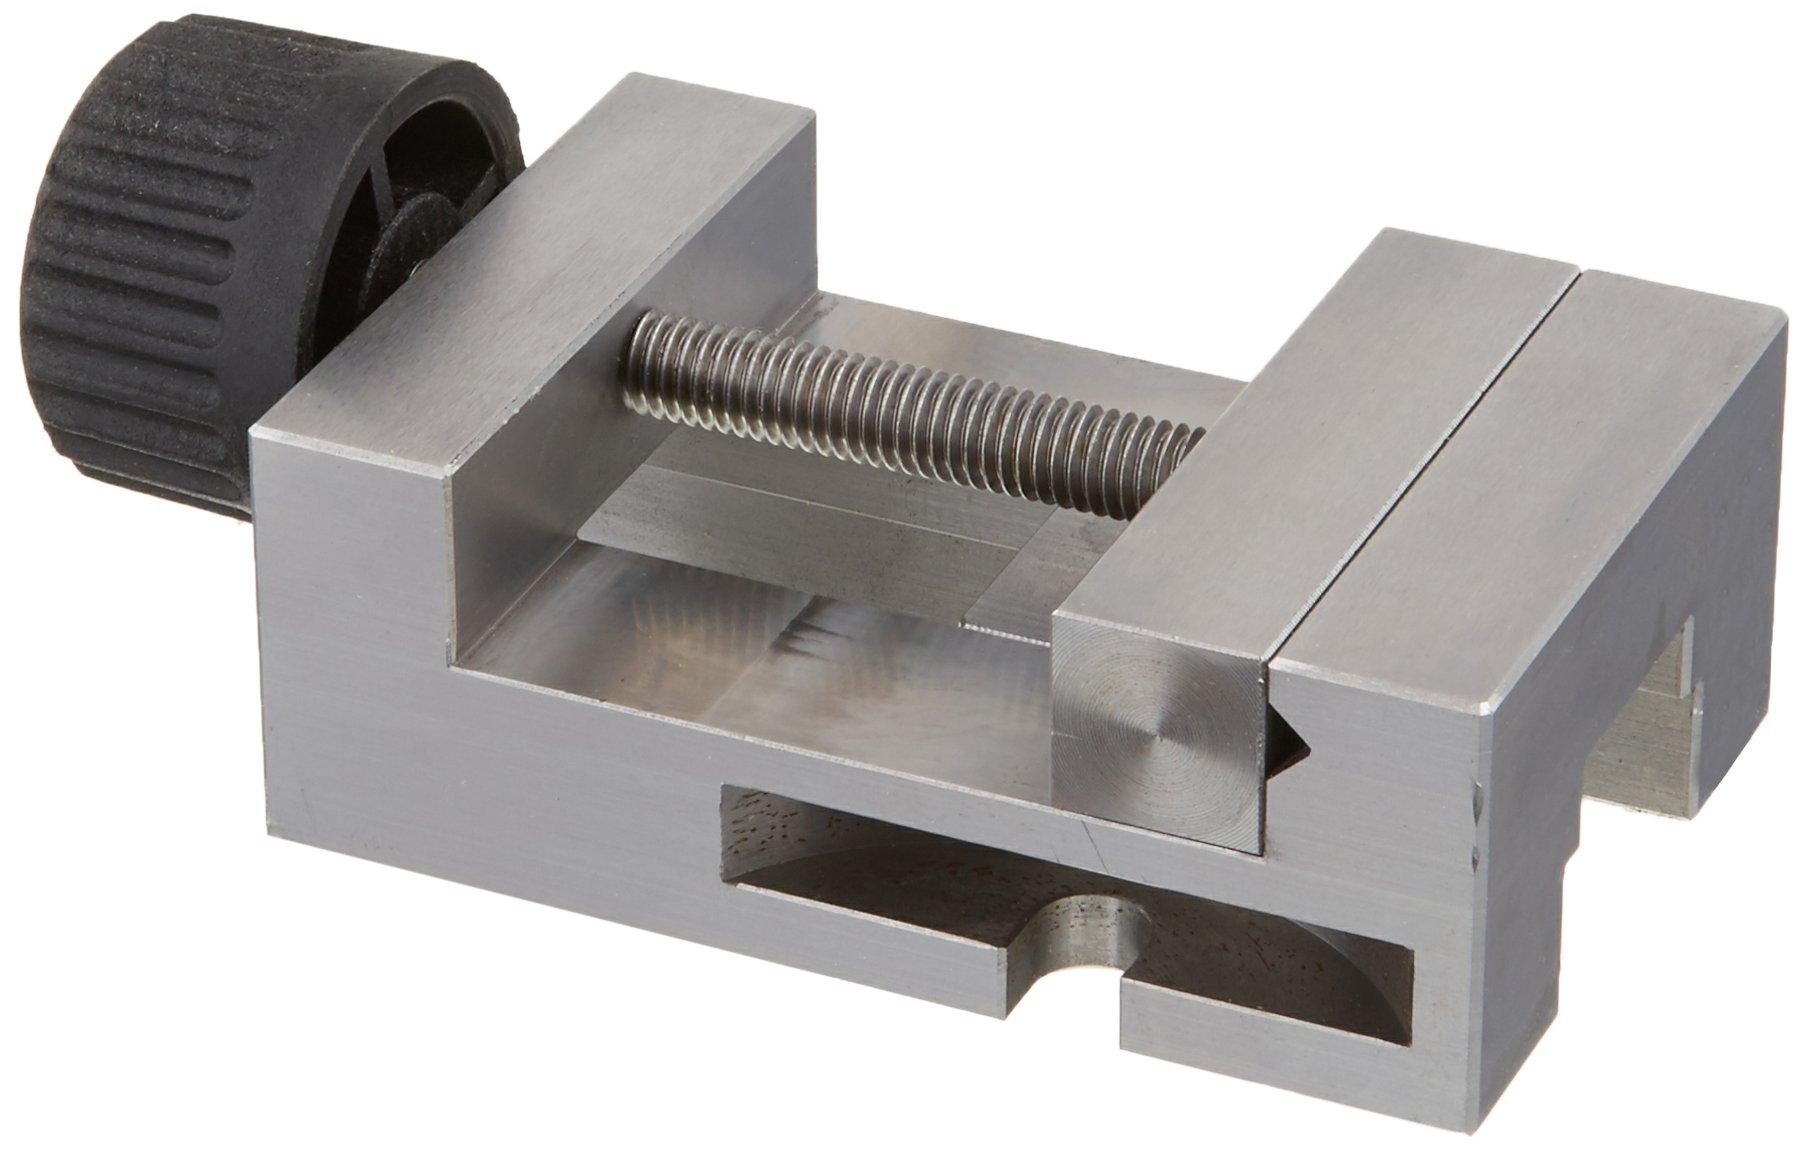 Proxxon 28876 HSS Twist Drill Set Titanium Nitride Coated with Brad Point